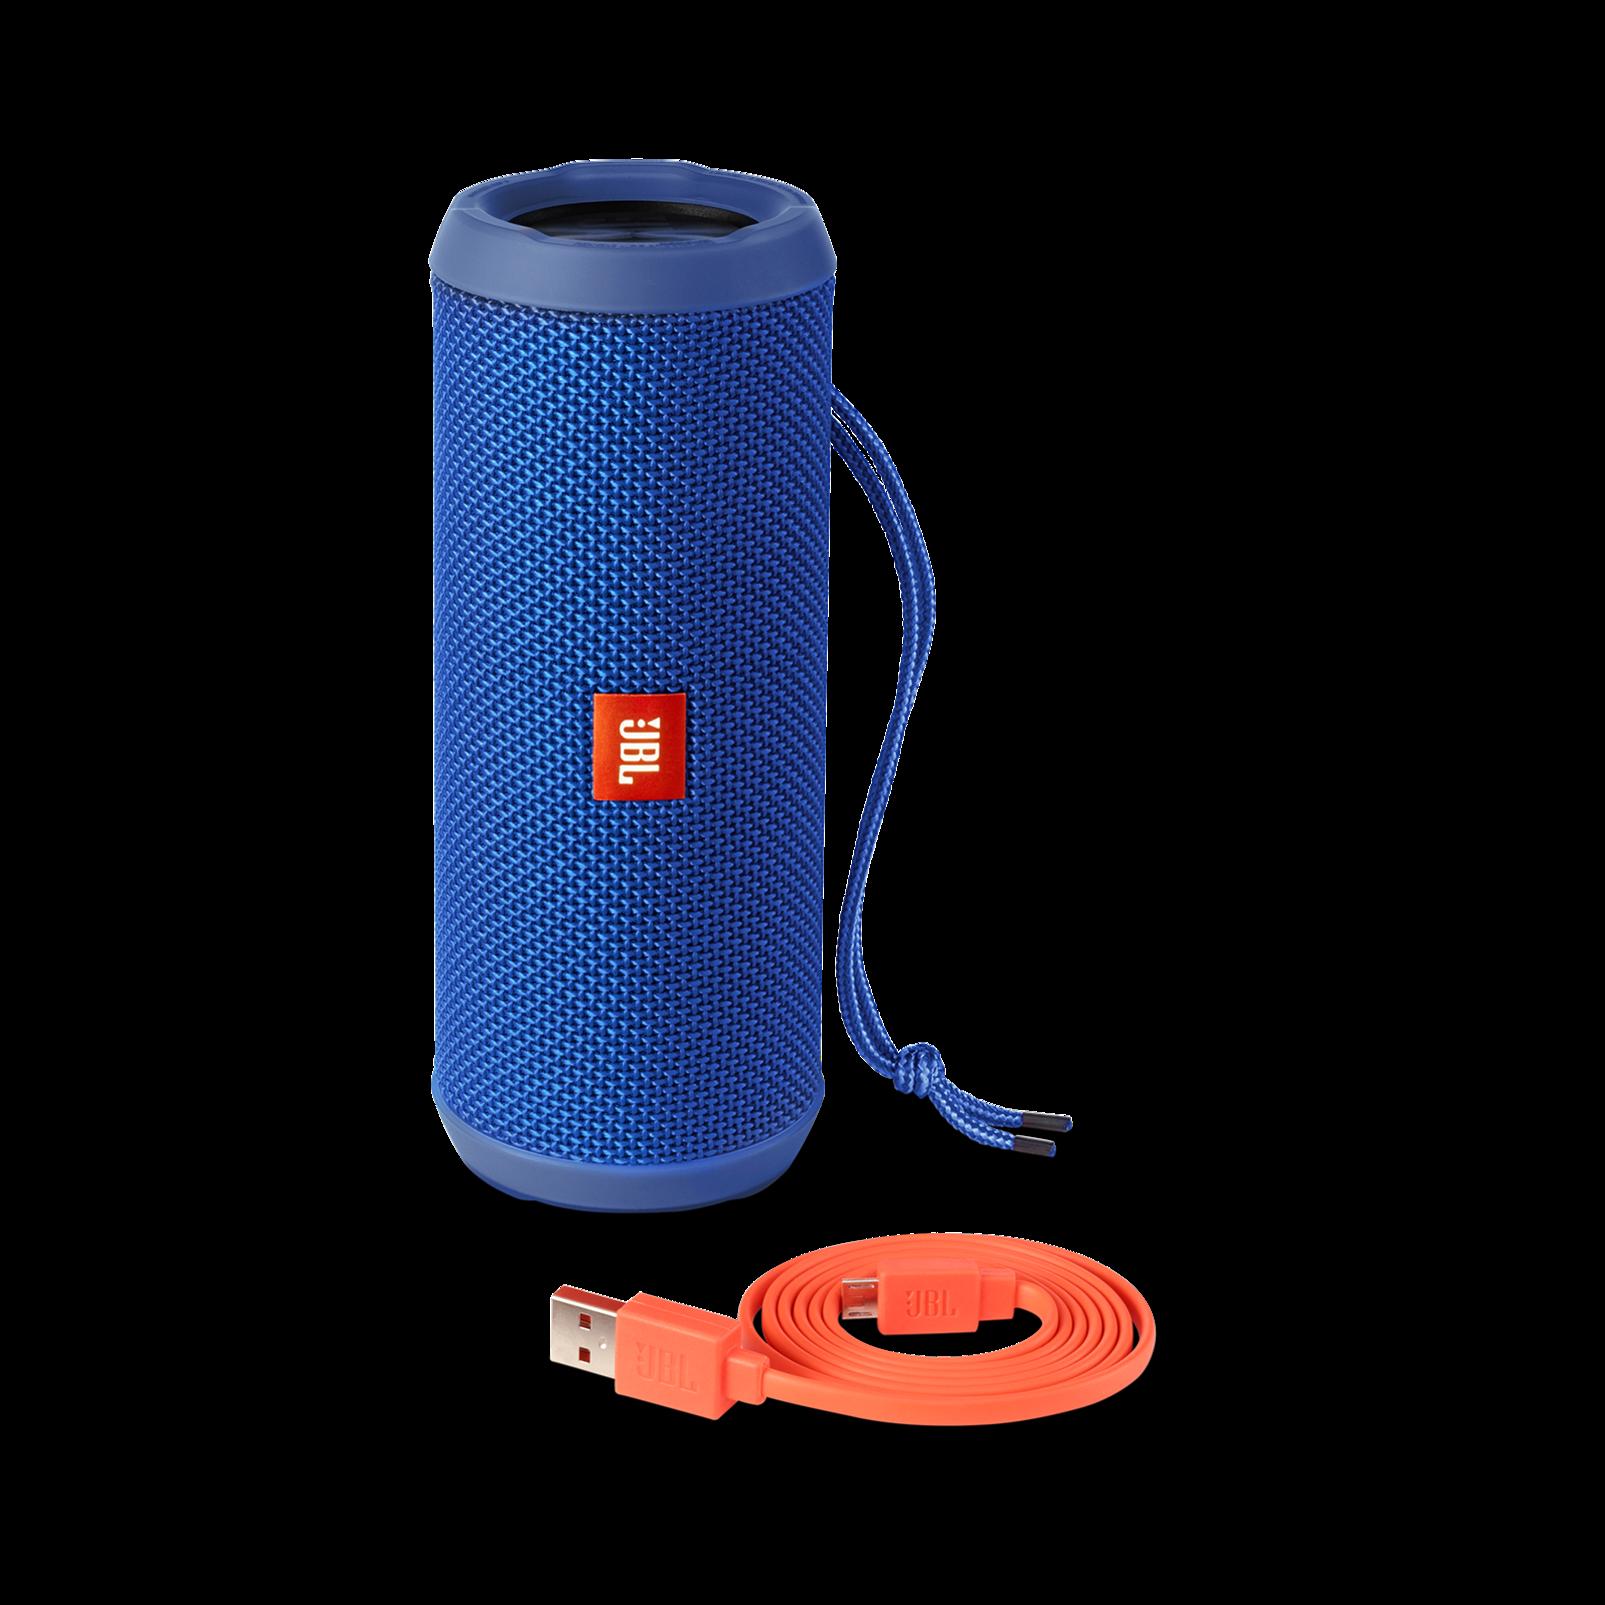 JBL Flip 3 - Blue - Splashproof portable Bluetooth speaker with powerful sound and speakerphone technology - Detailshot 4